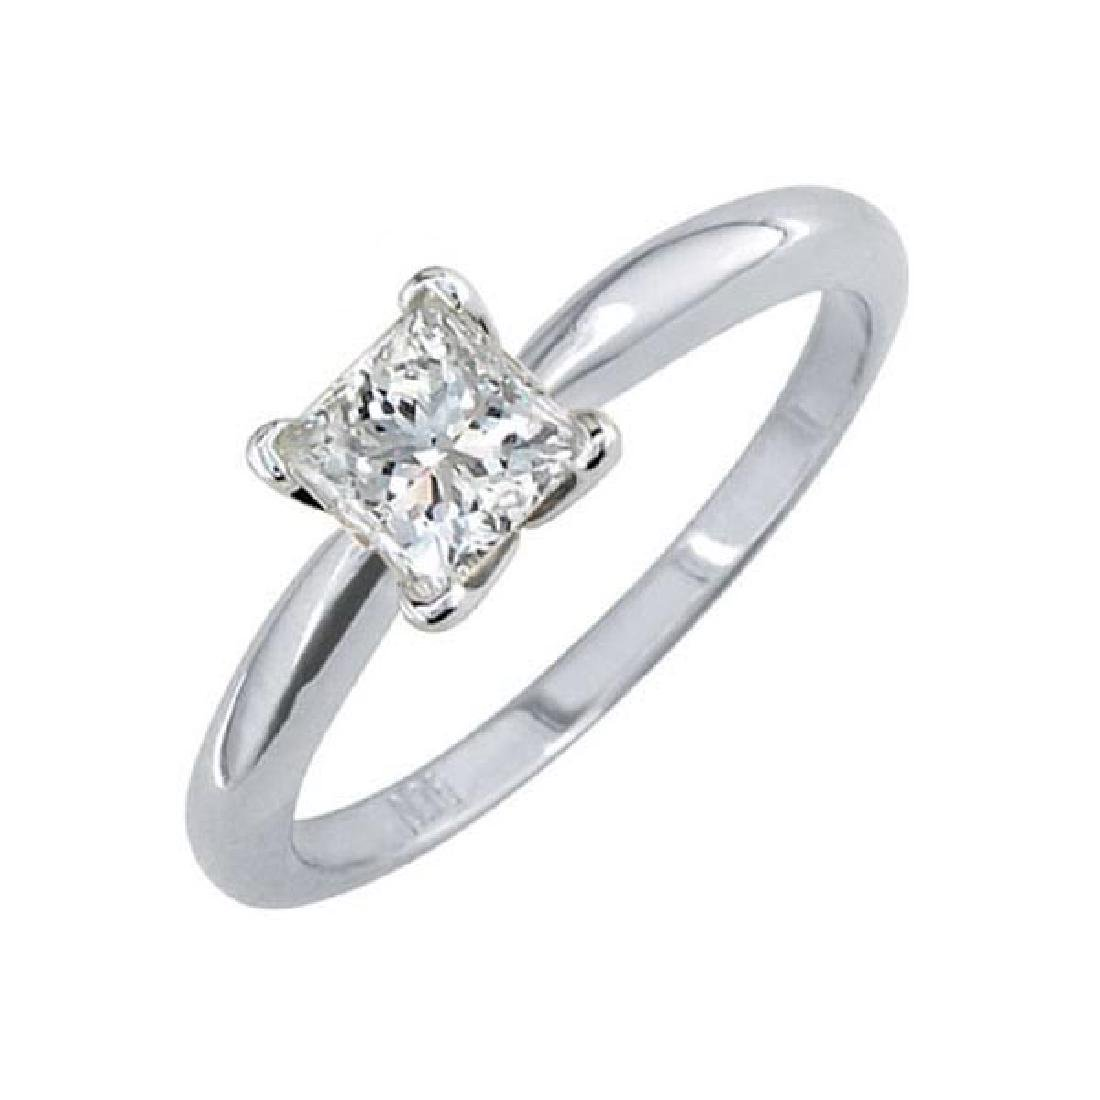 Certified 0.4 CTW Princess Diamond Solitaire 14k Ring F